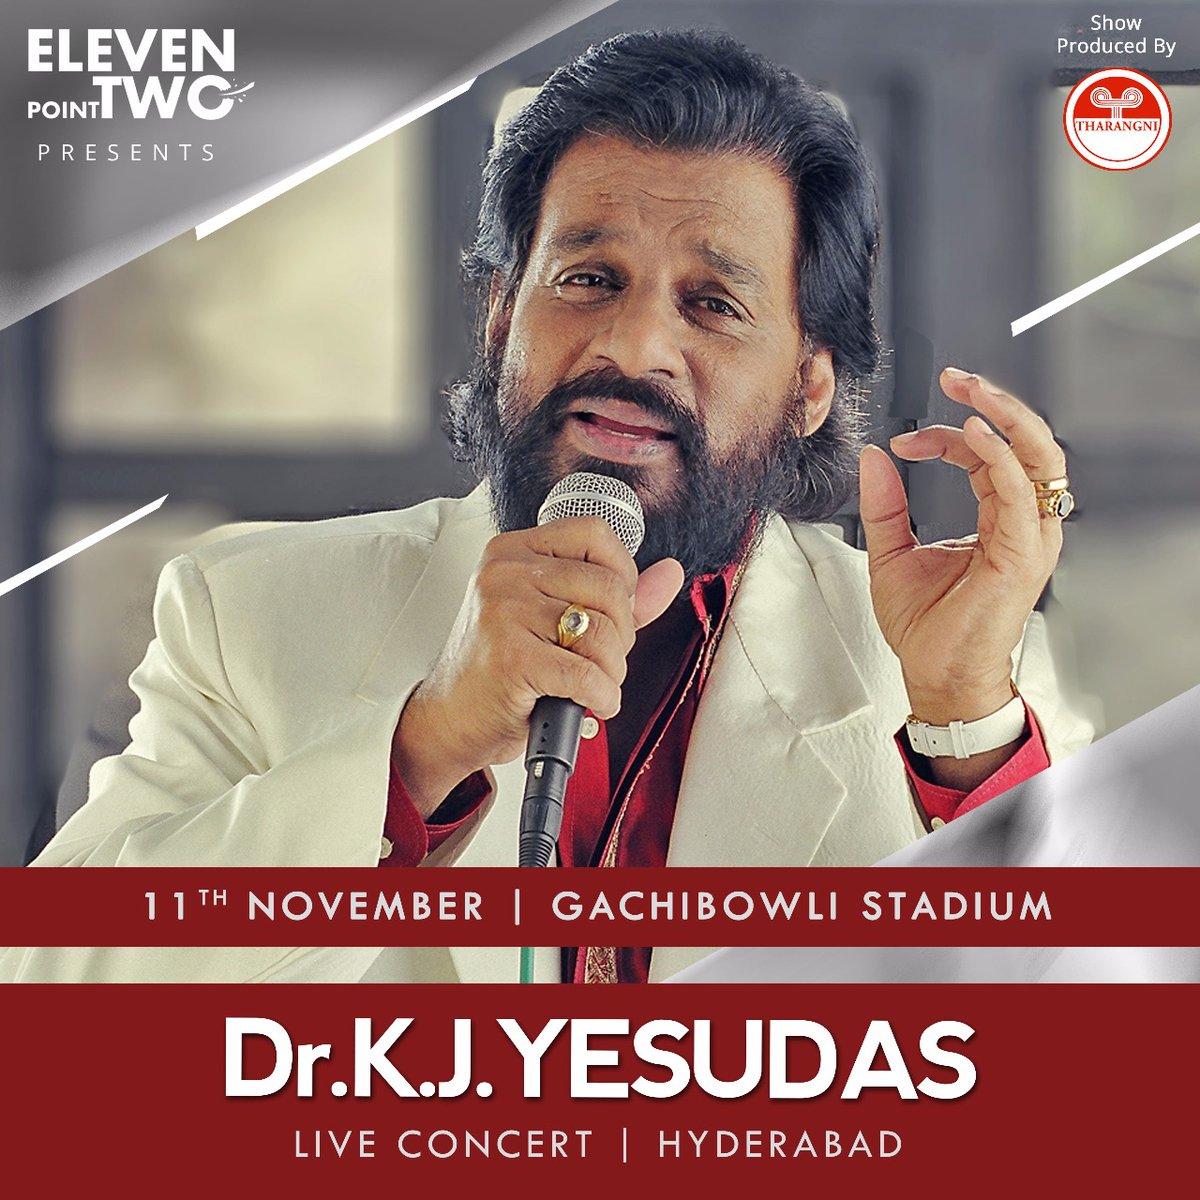 KJ Yesudas live concert hyderabad on 11th November